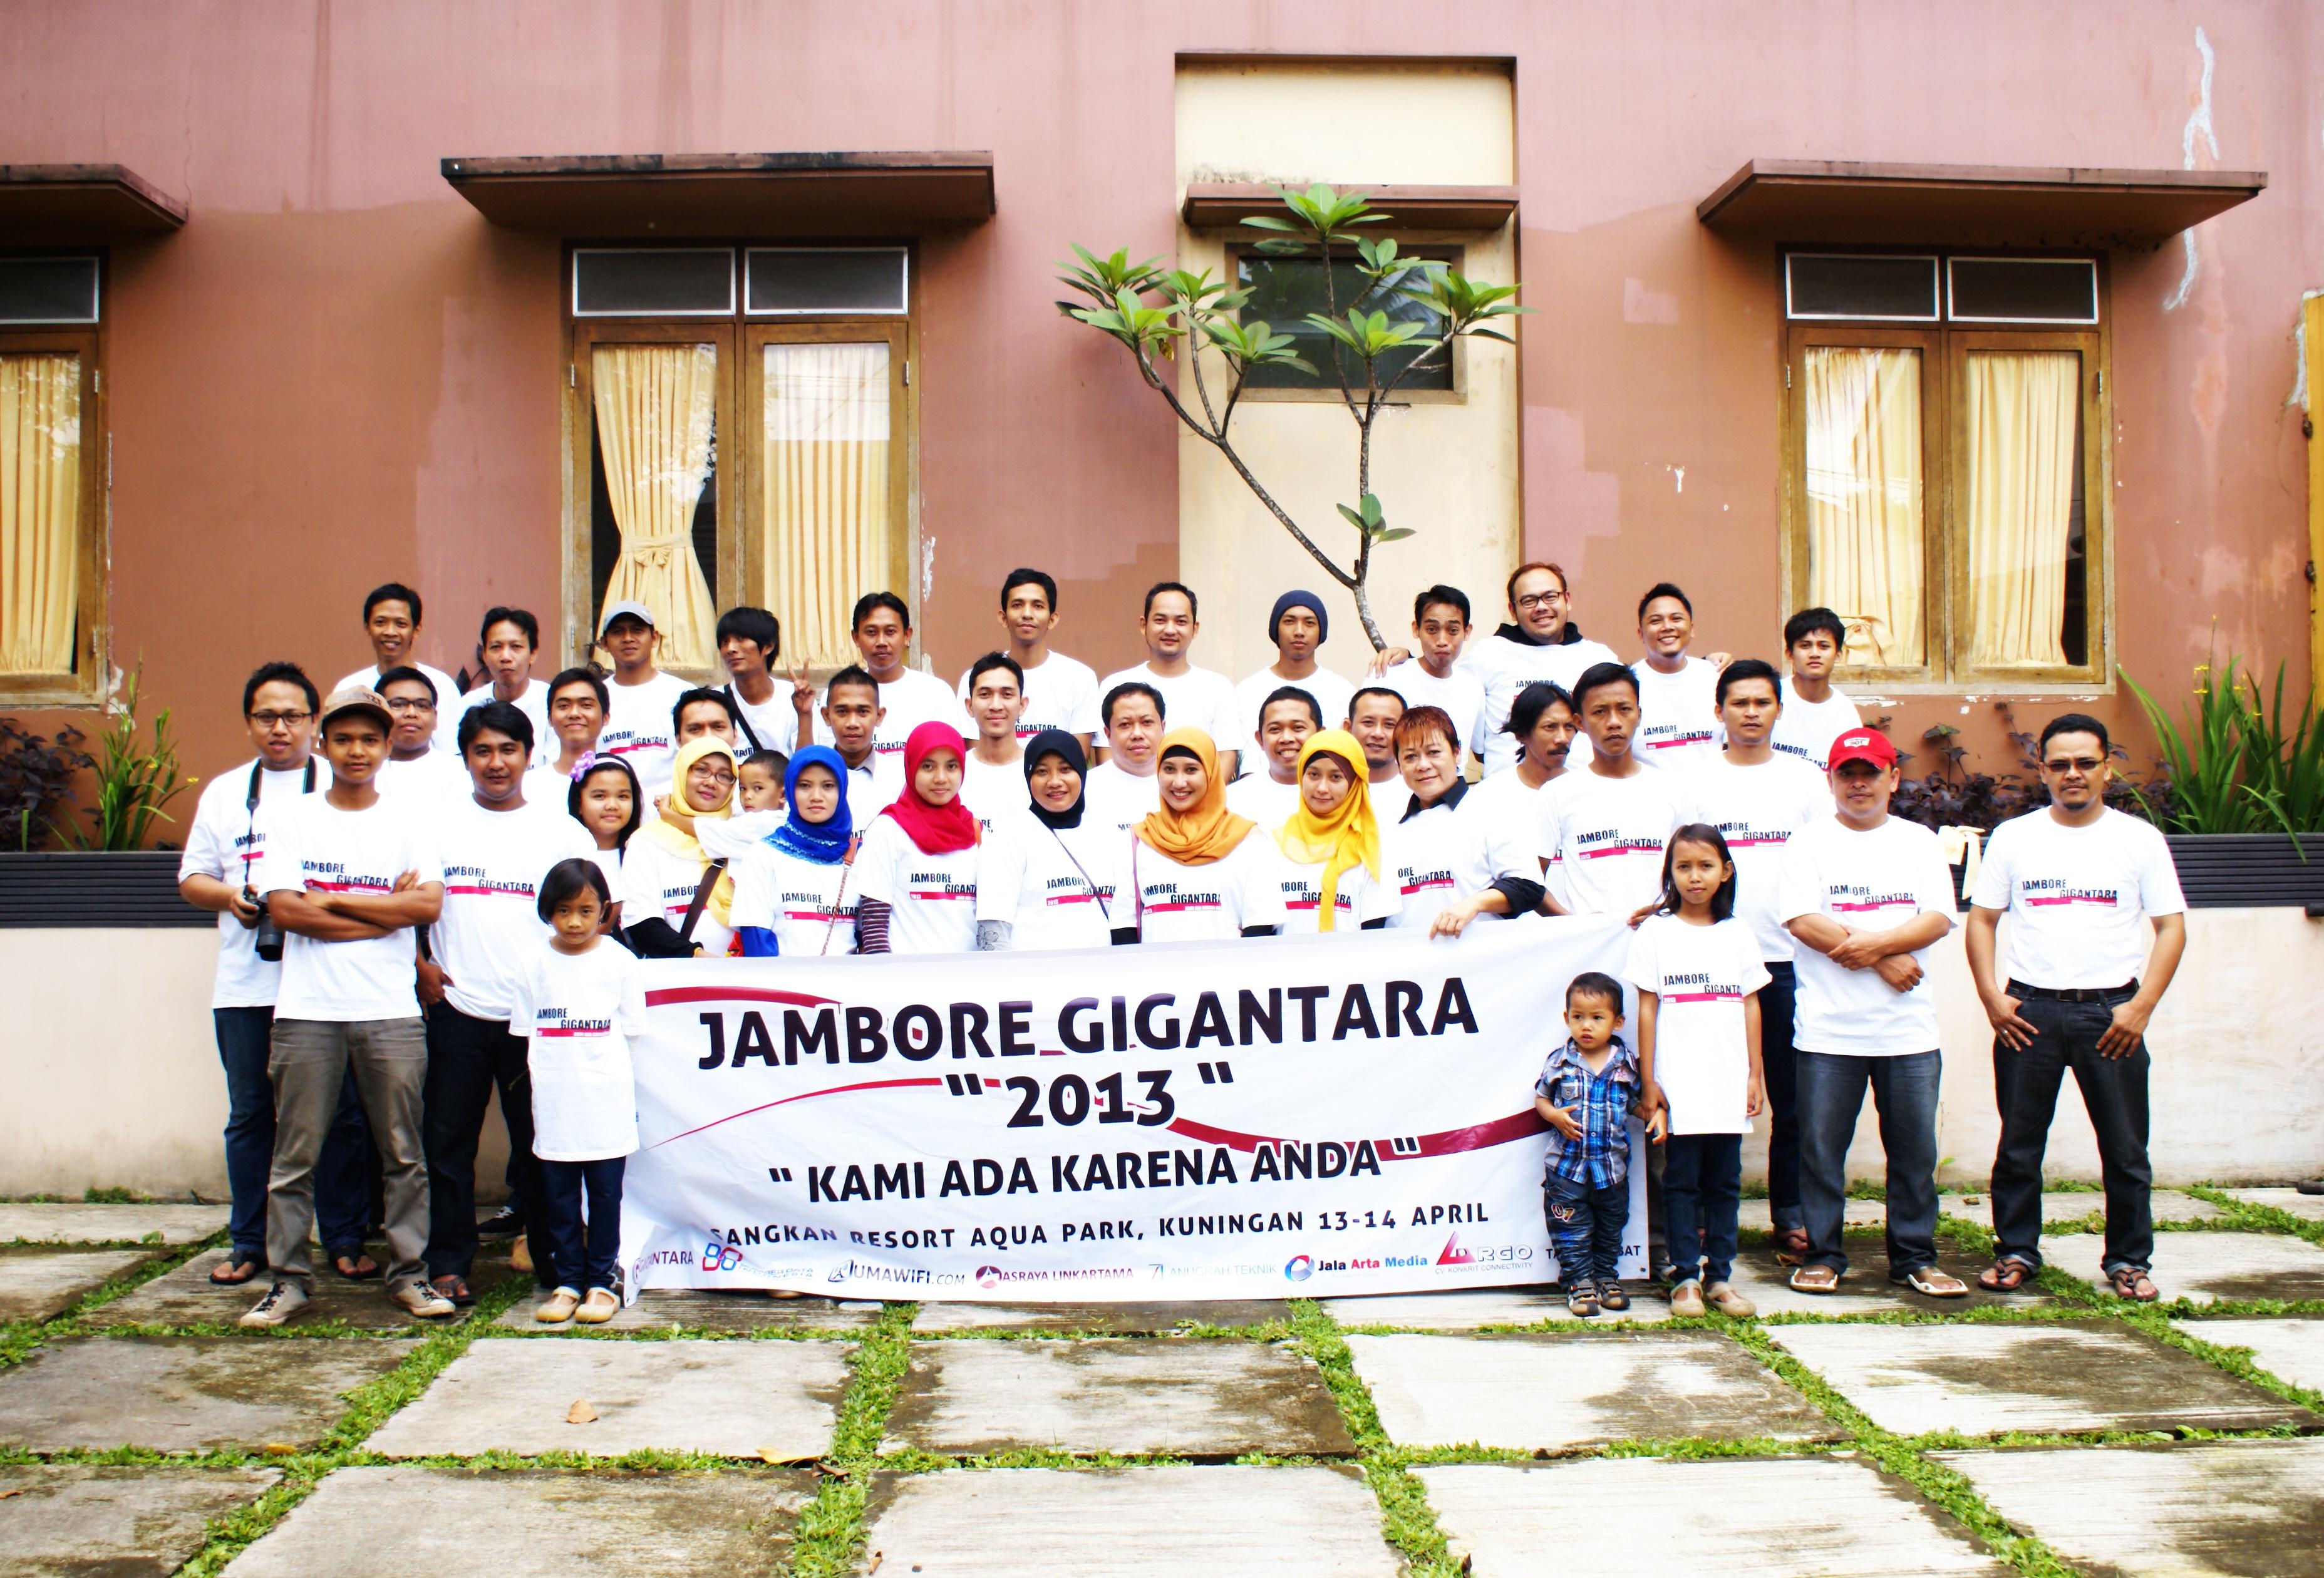 jambore pt giga network nusantara cirebon 2013